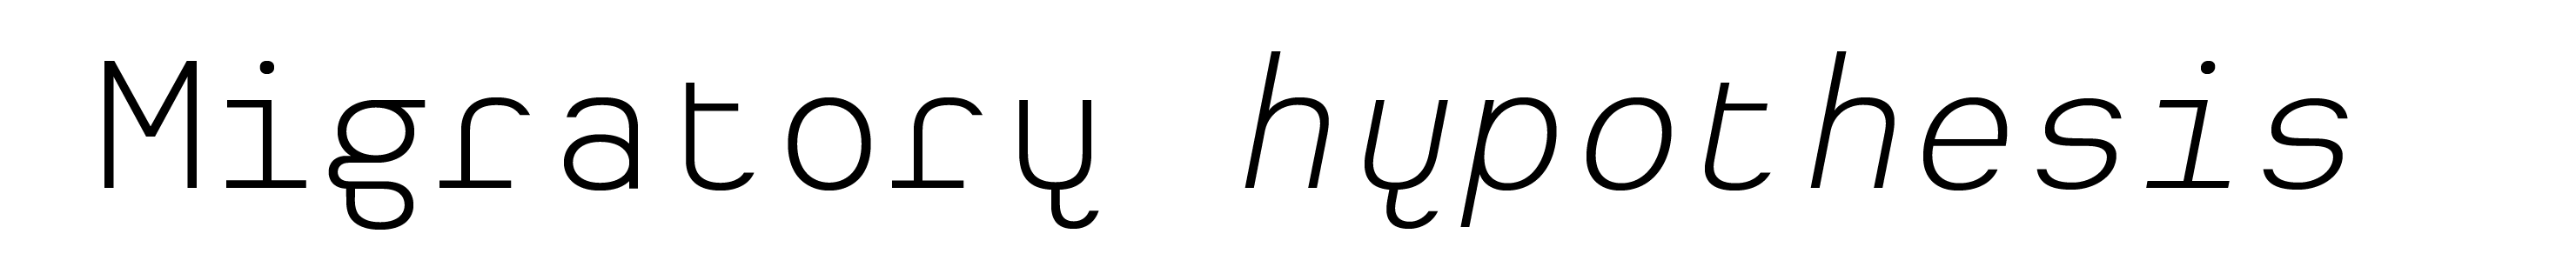 Typeface Heimat Mono D02 Atlas Font Foundry